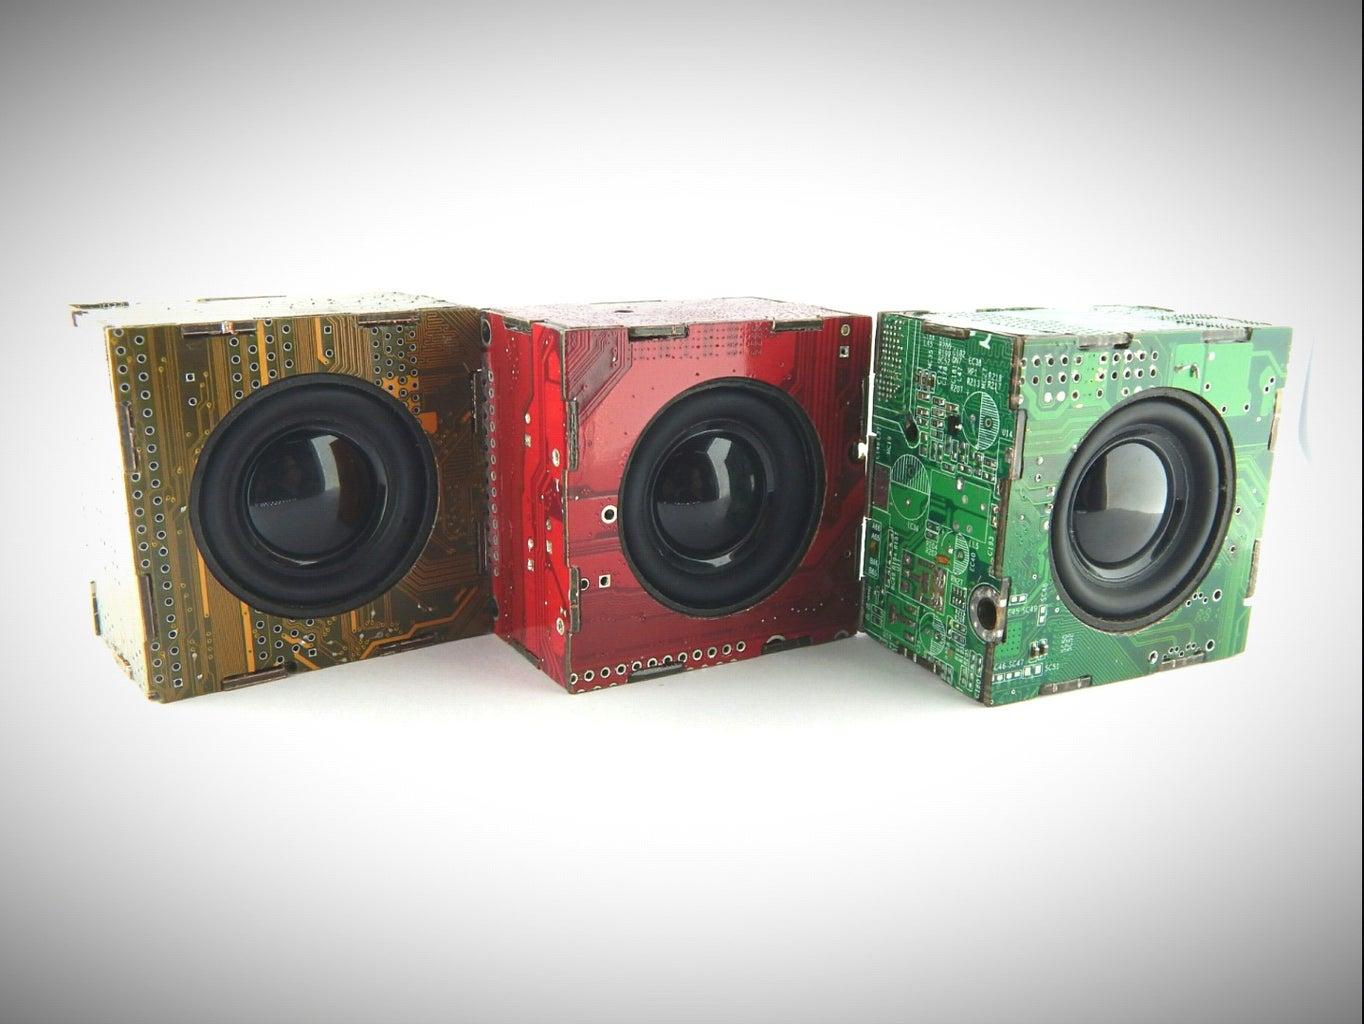 PCB Motherboard Speaker